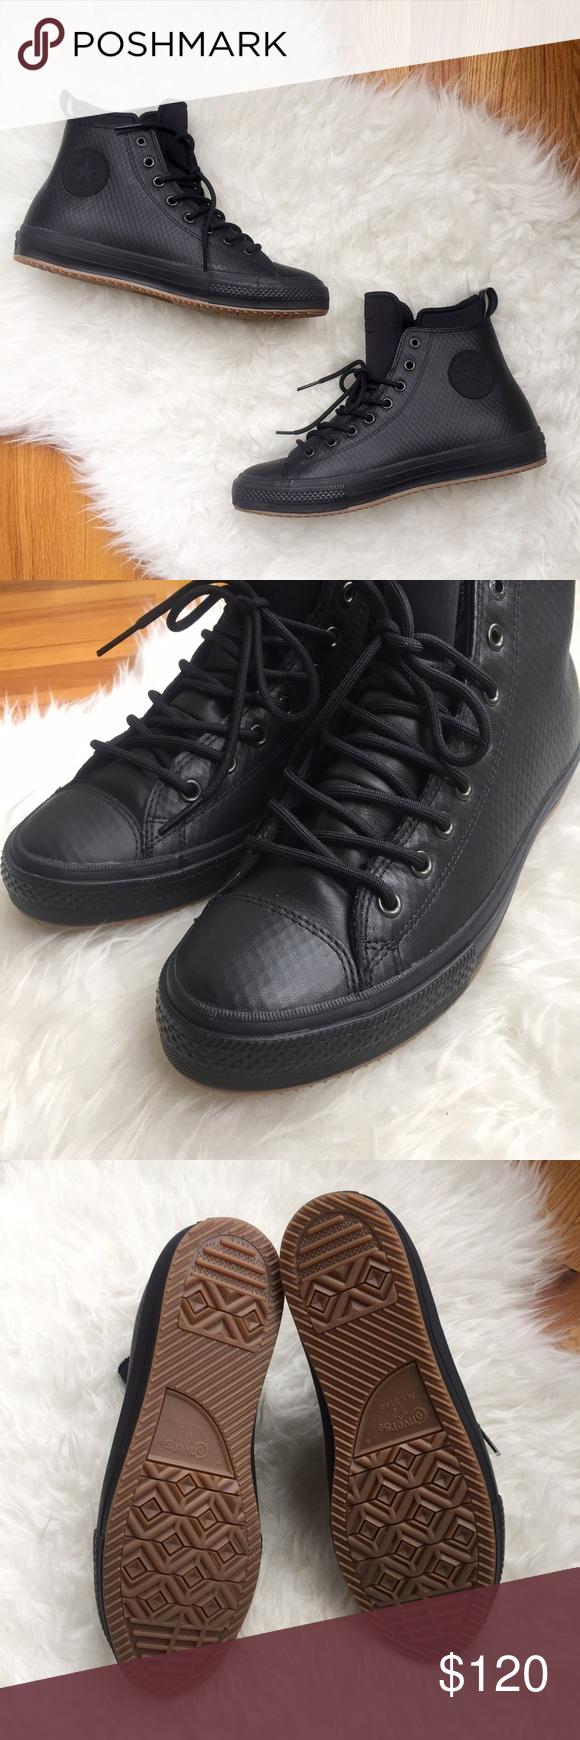 Großhandel NWT: Converse Chuck II Waterproof Leather Boot Brand new